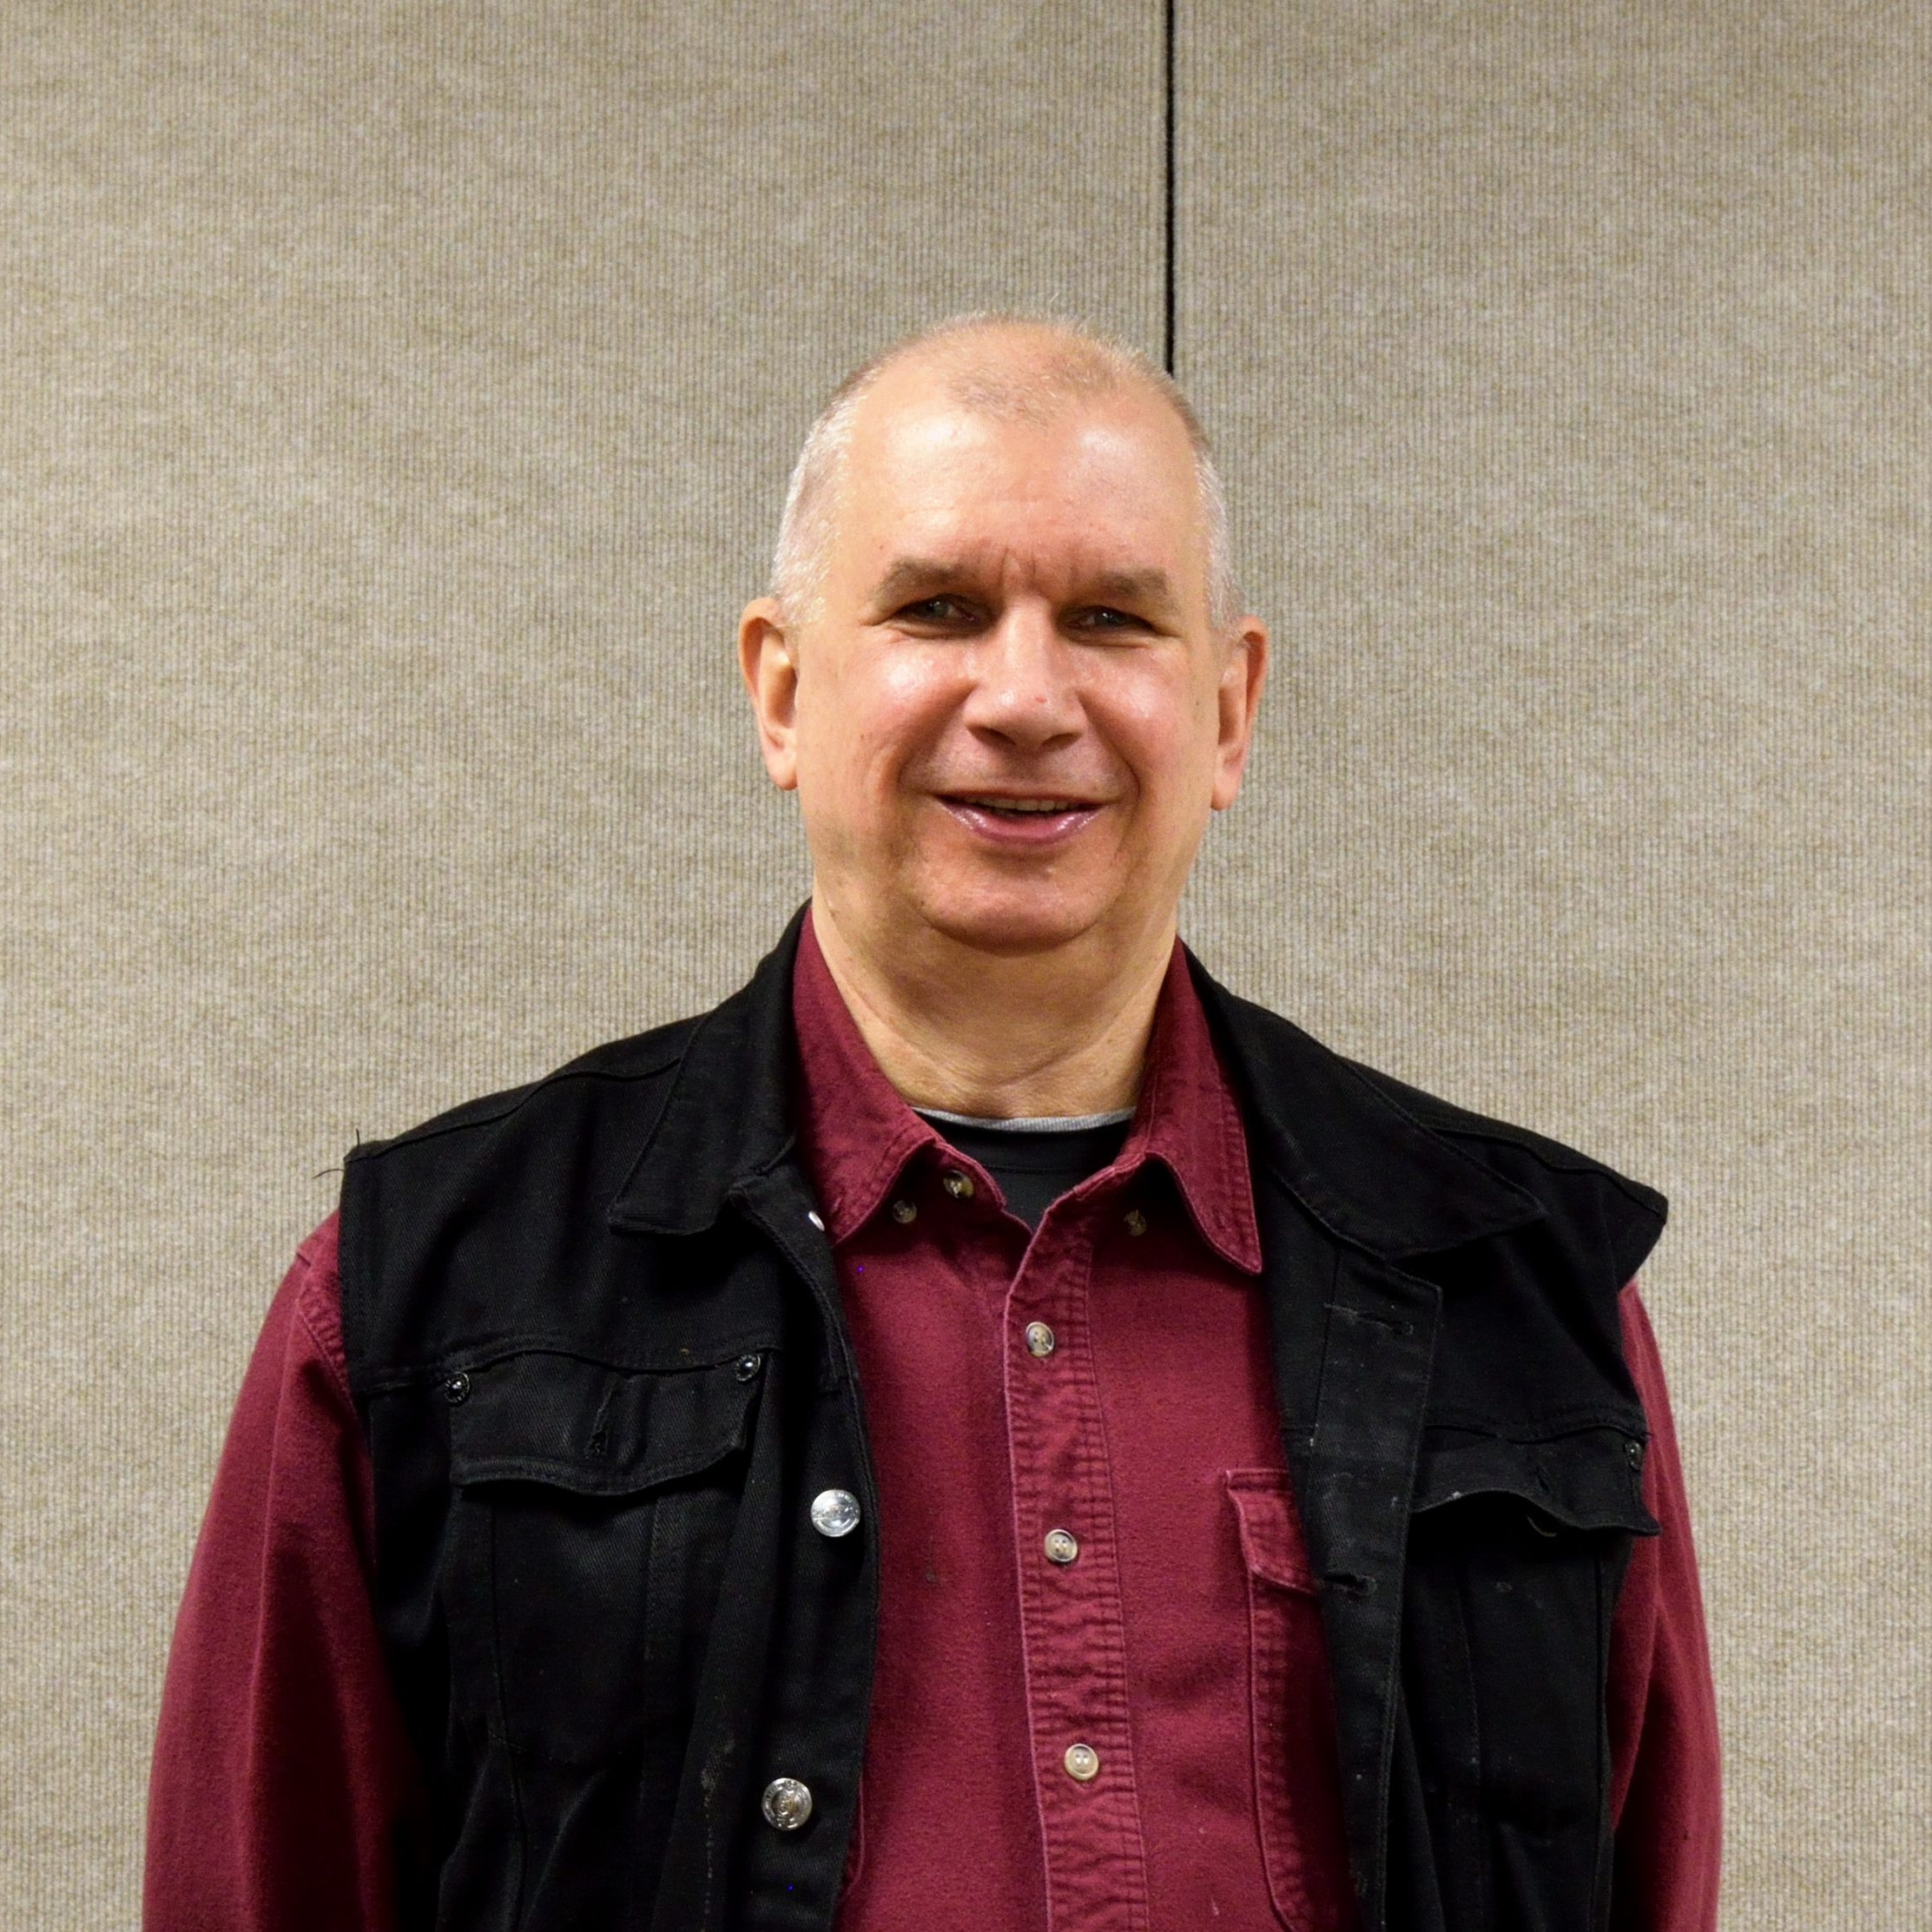 Jim Mabee